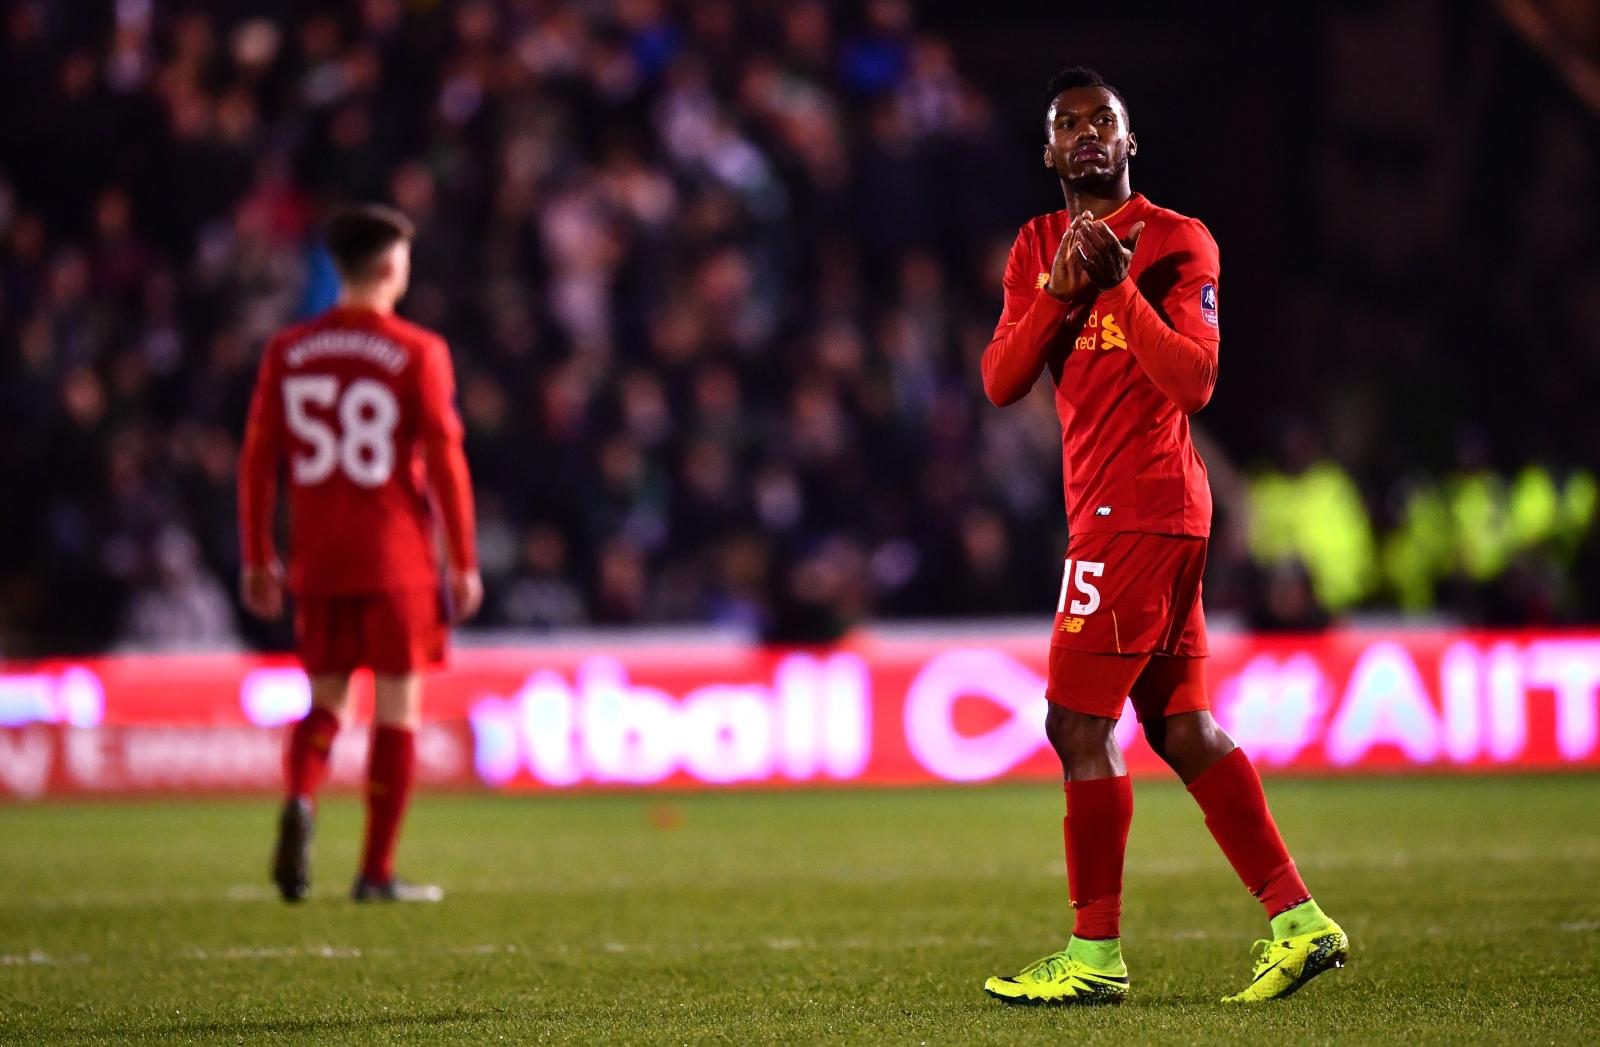 Romeu earns Southampton extension as Puel targets away goal